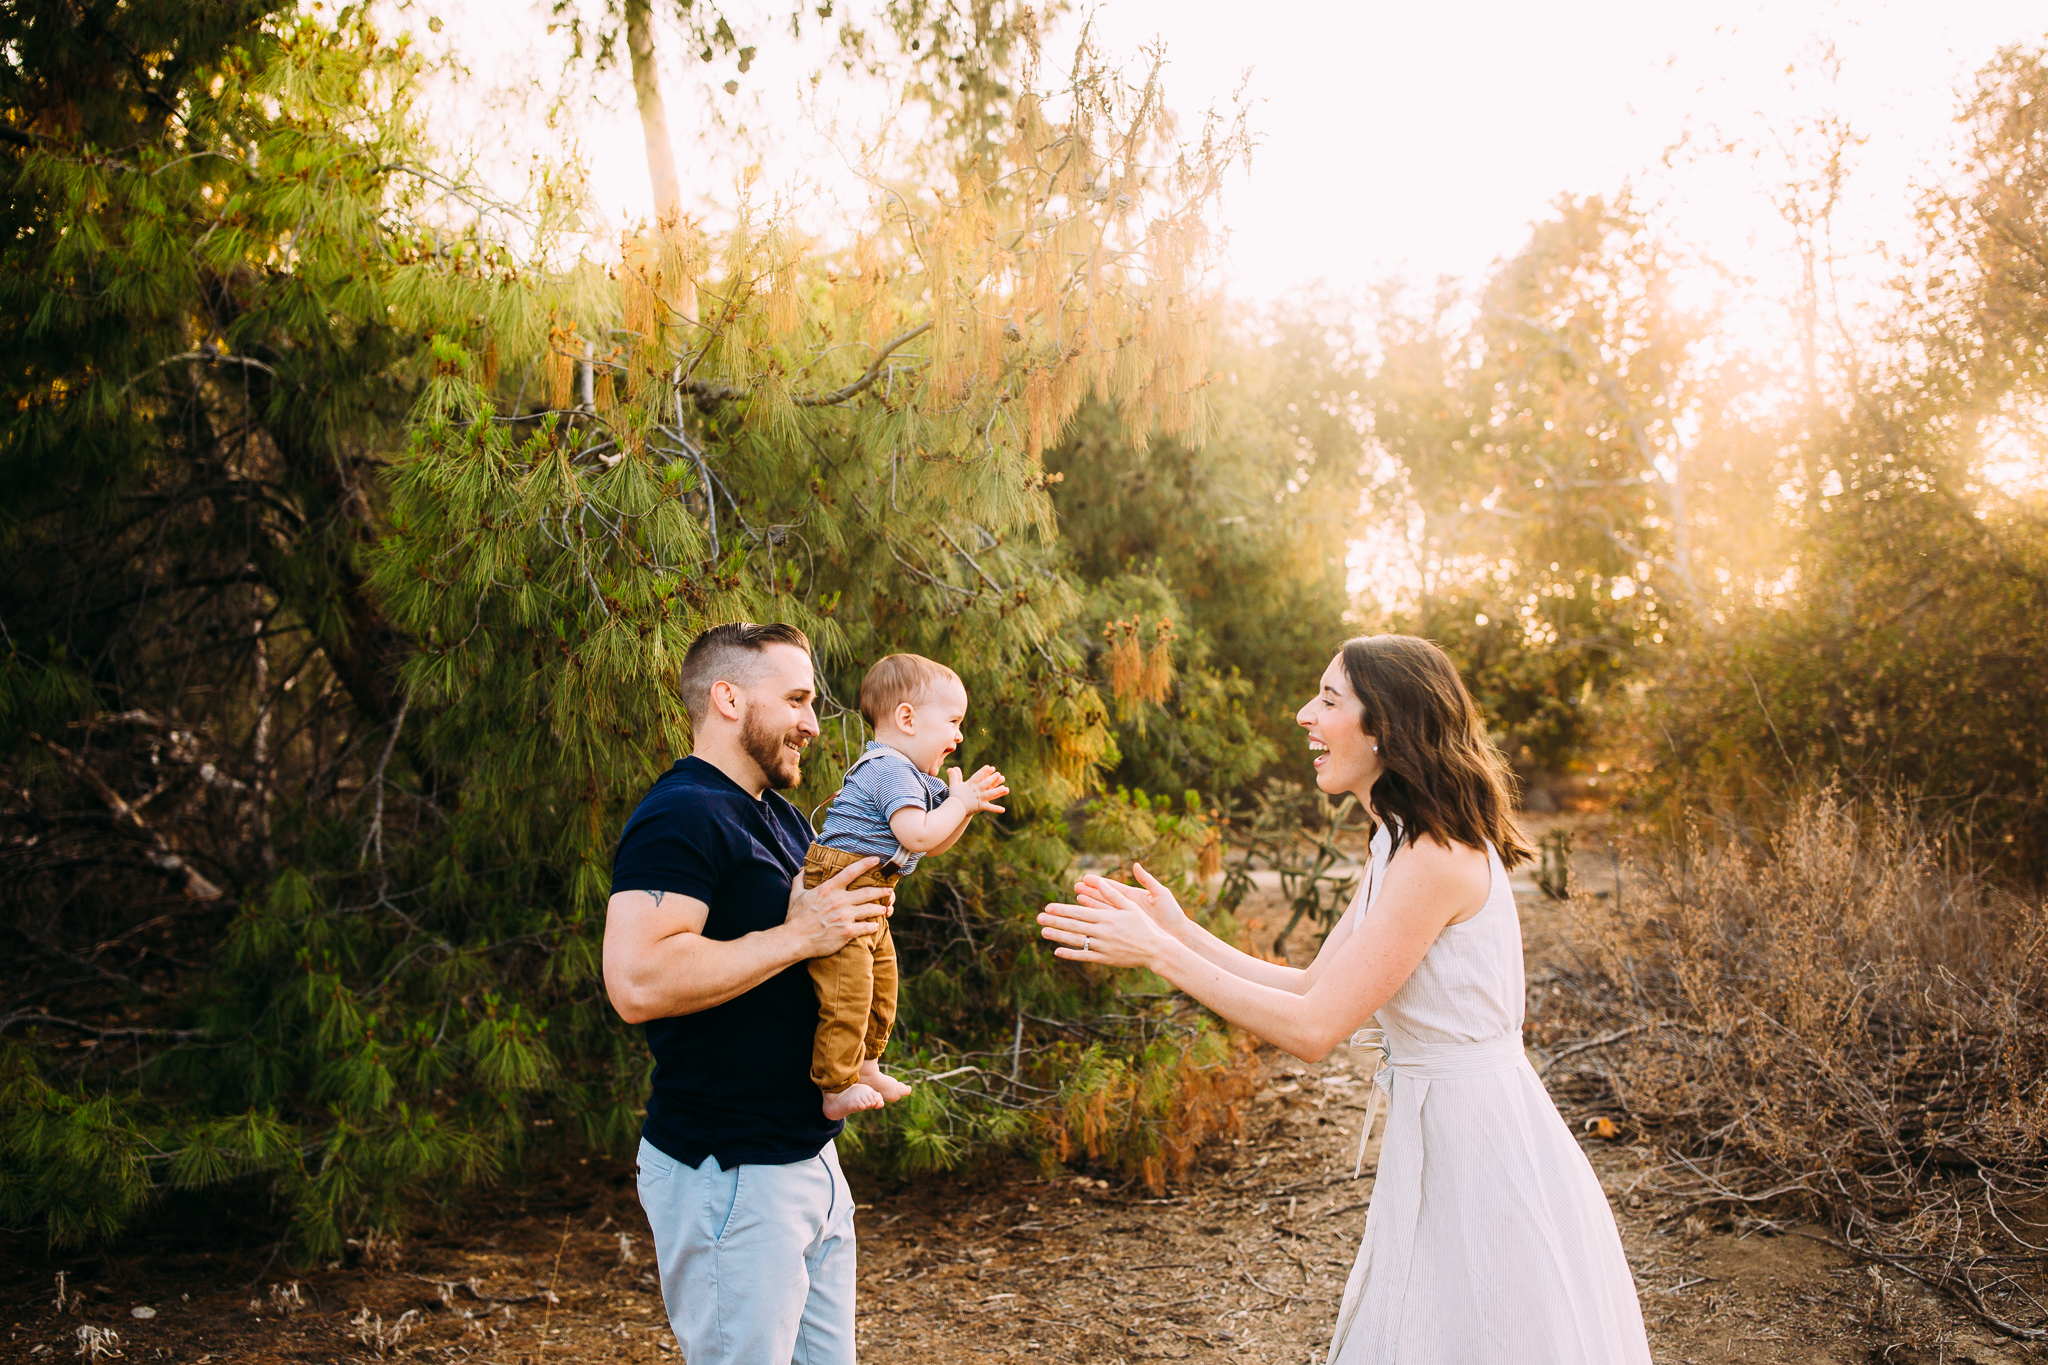 irvinefamilyphotographer-4.jpg